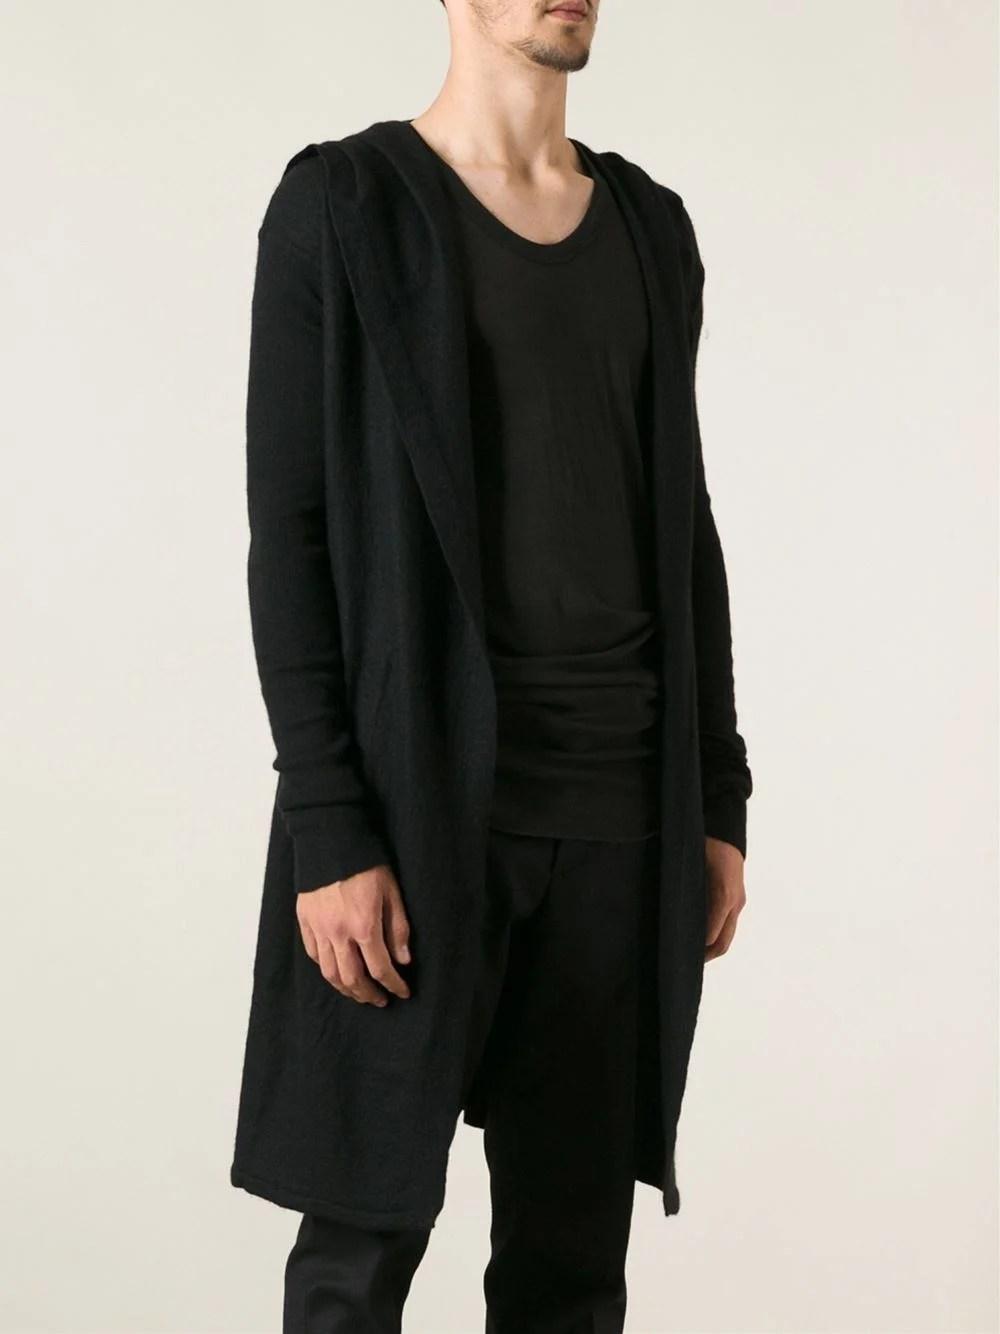 Long Black Cardigan With Hood  Sweater Vest